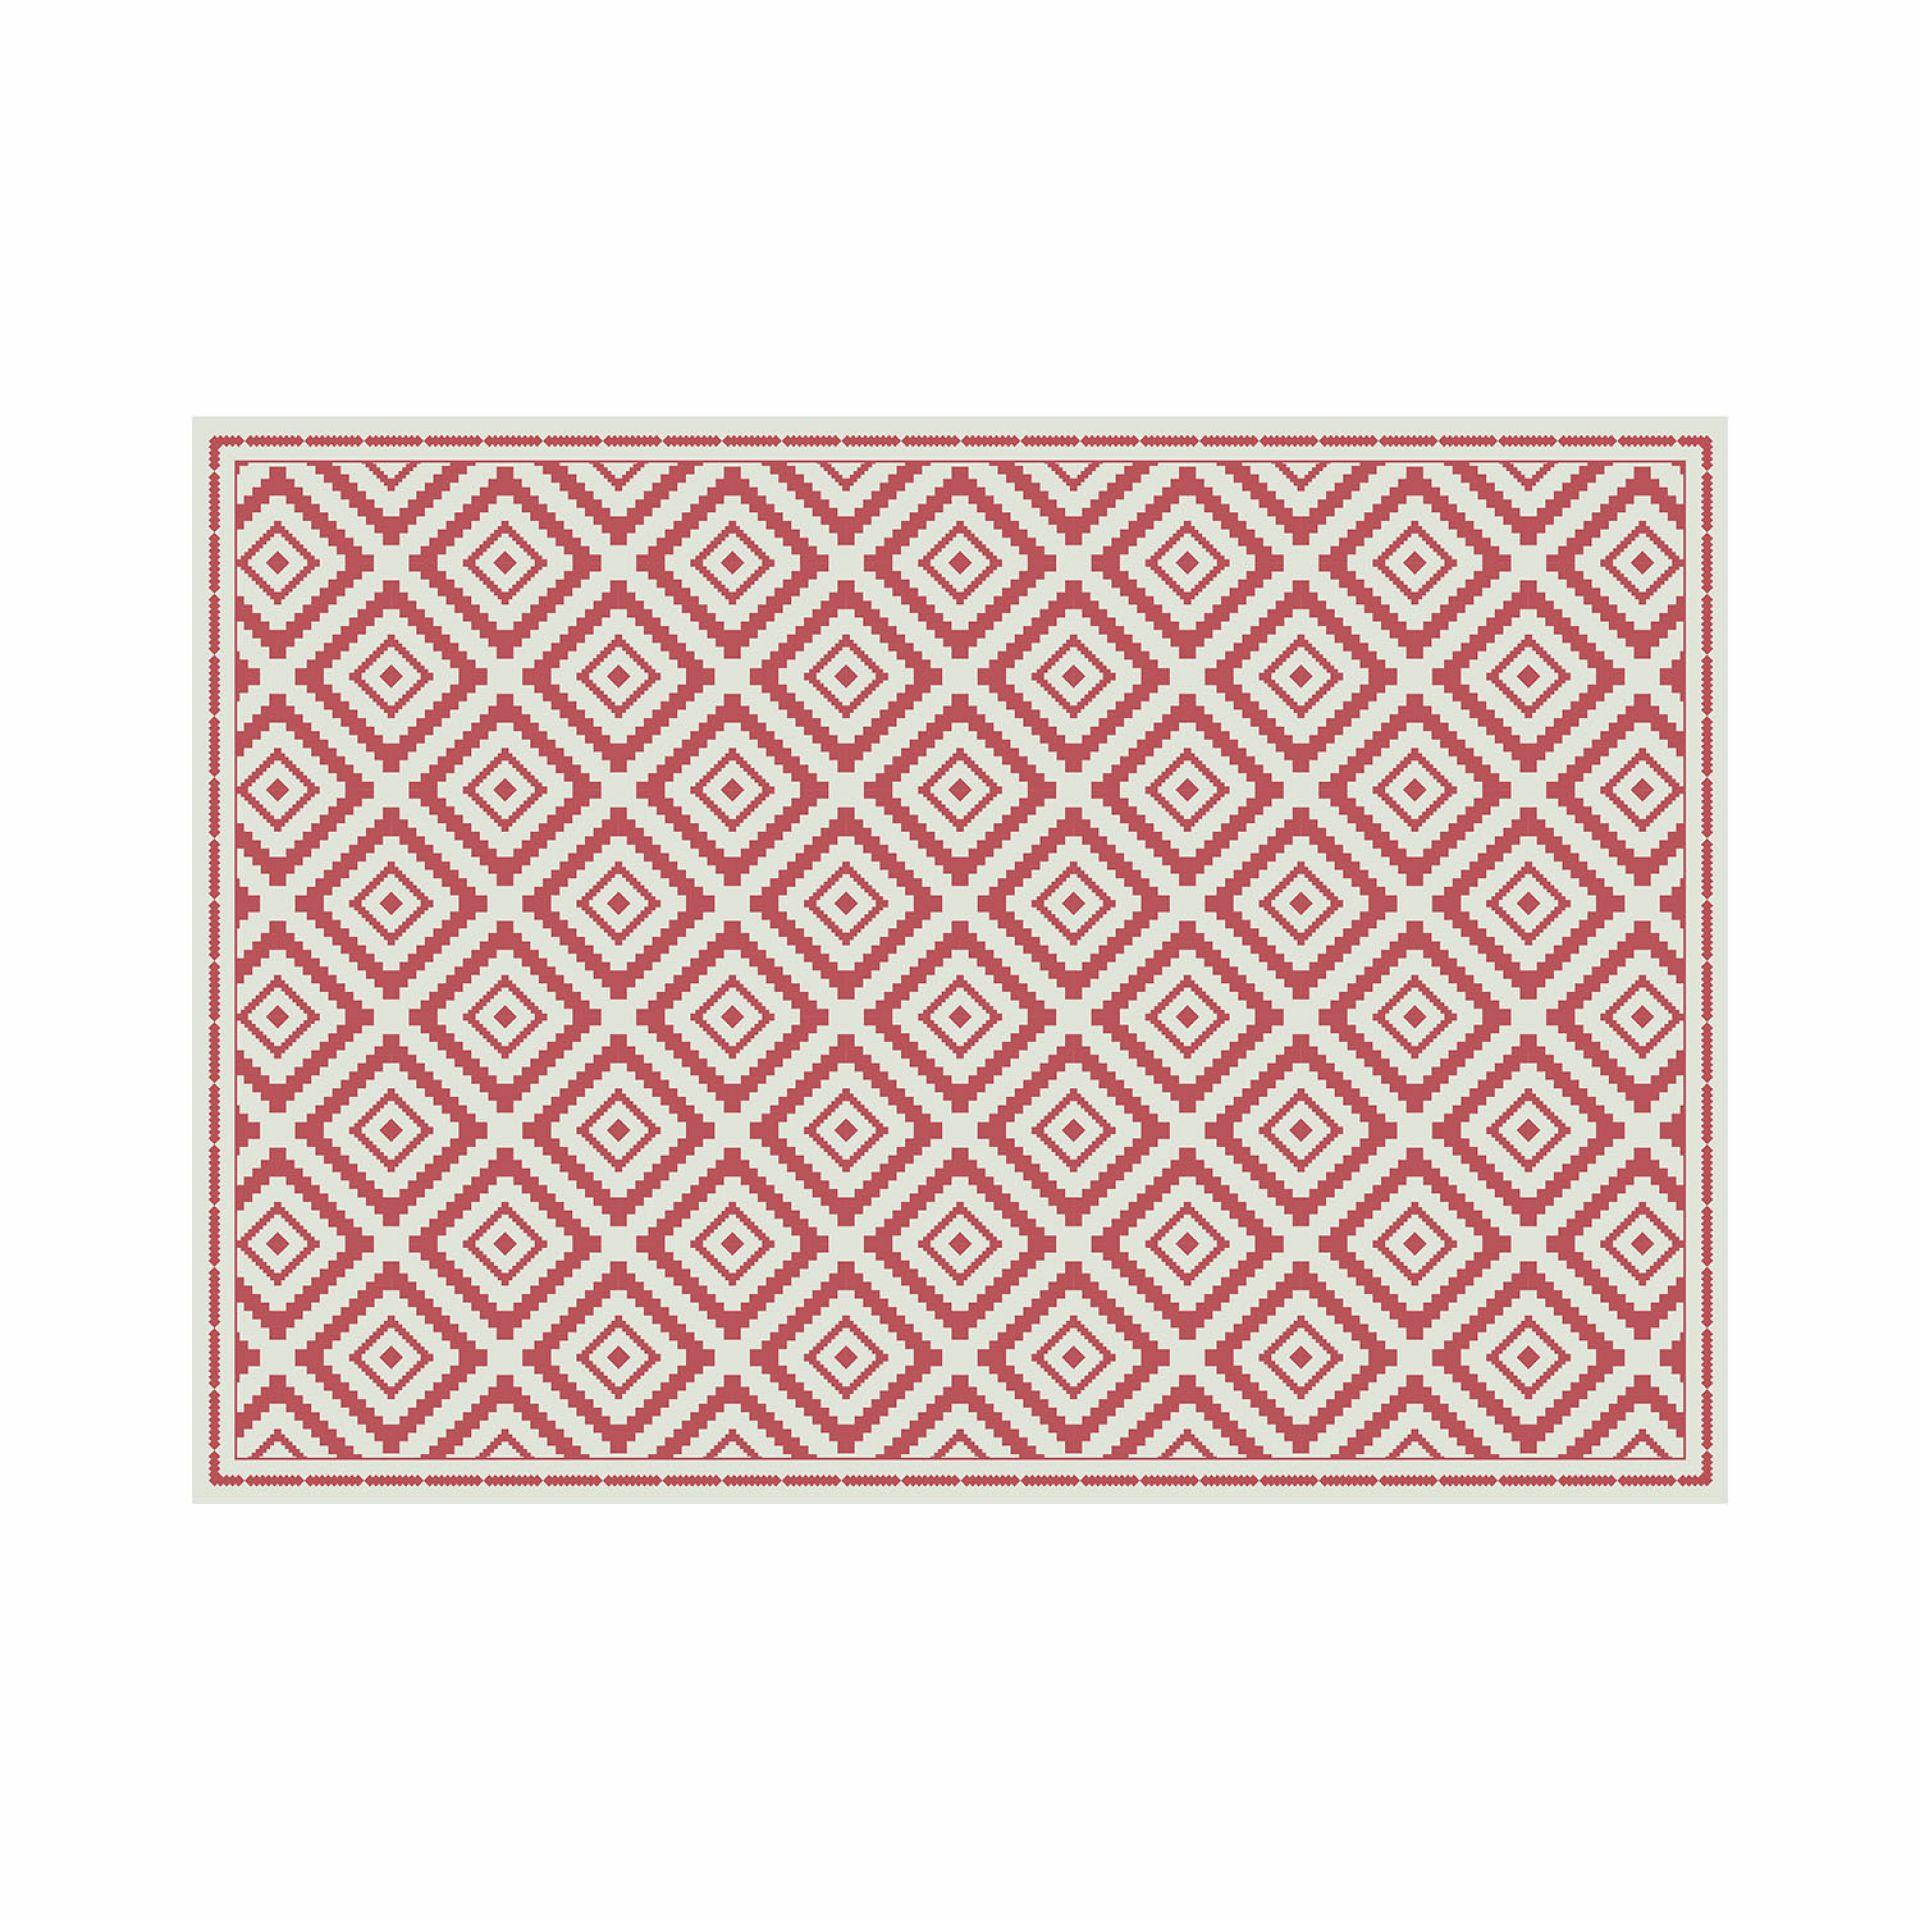 Matteo Vinyl Carpet Ethno Contento 90x60 cm